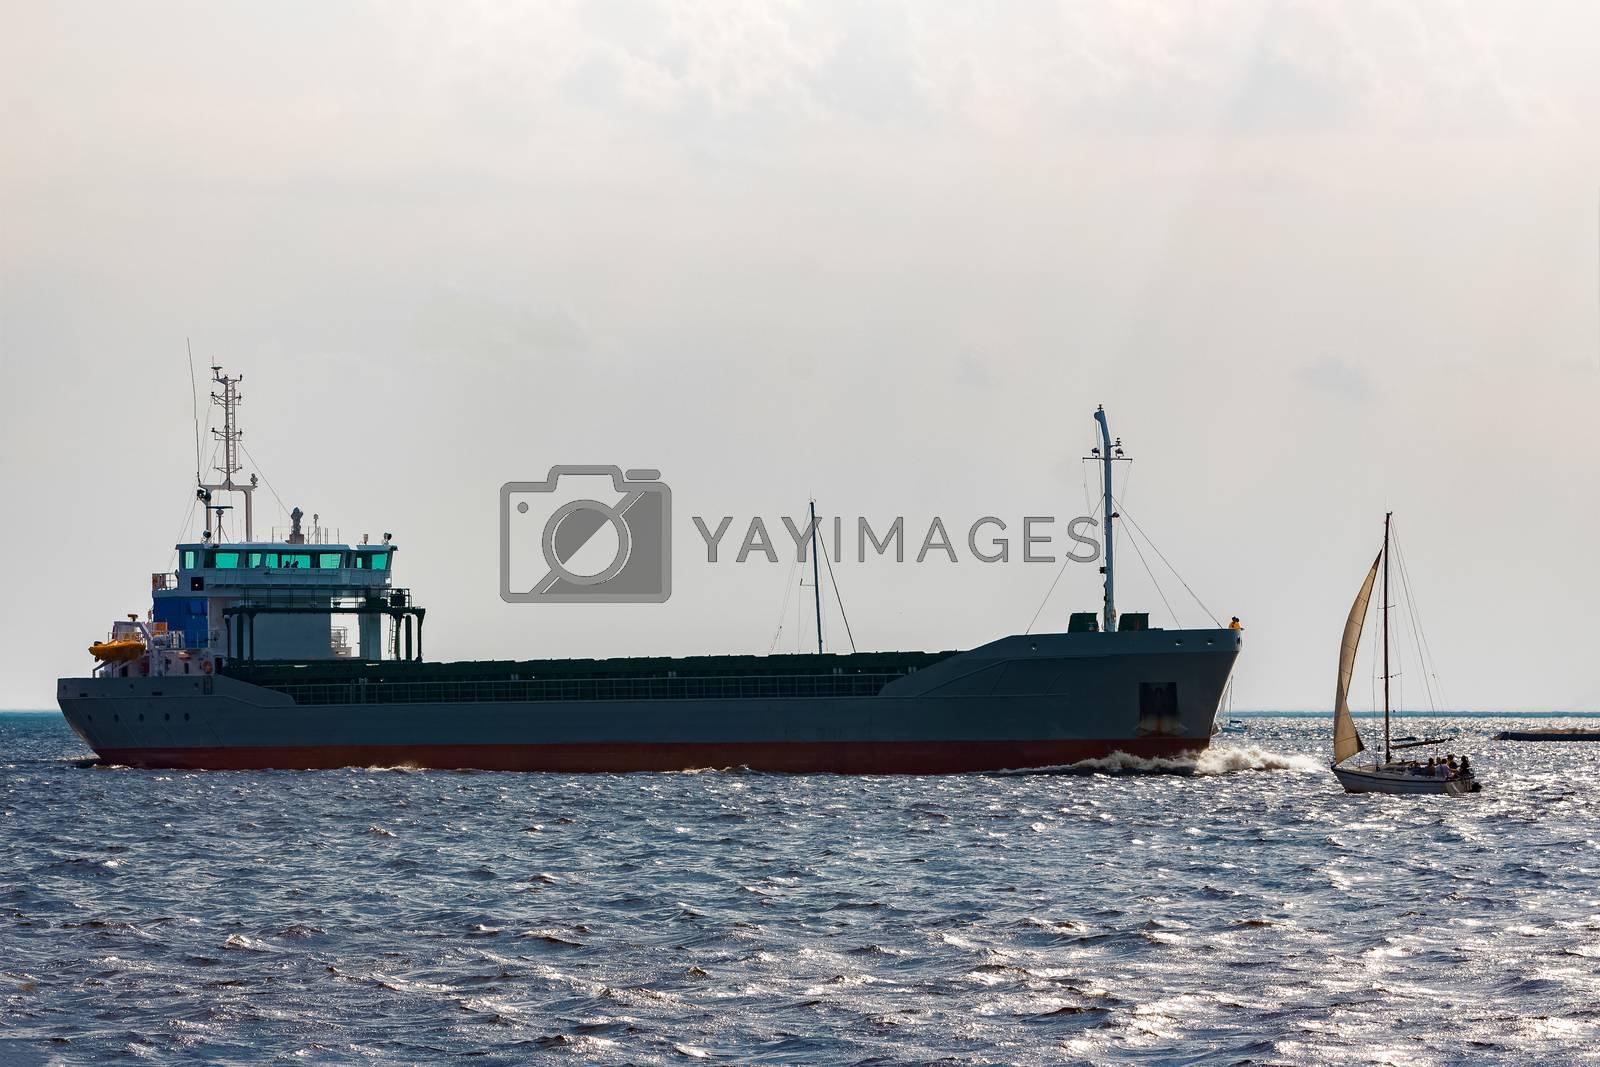 Grey bulker ship. Logistics and merchandise transportations